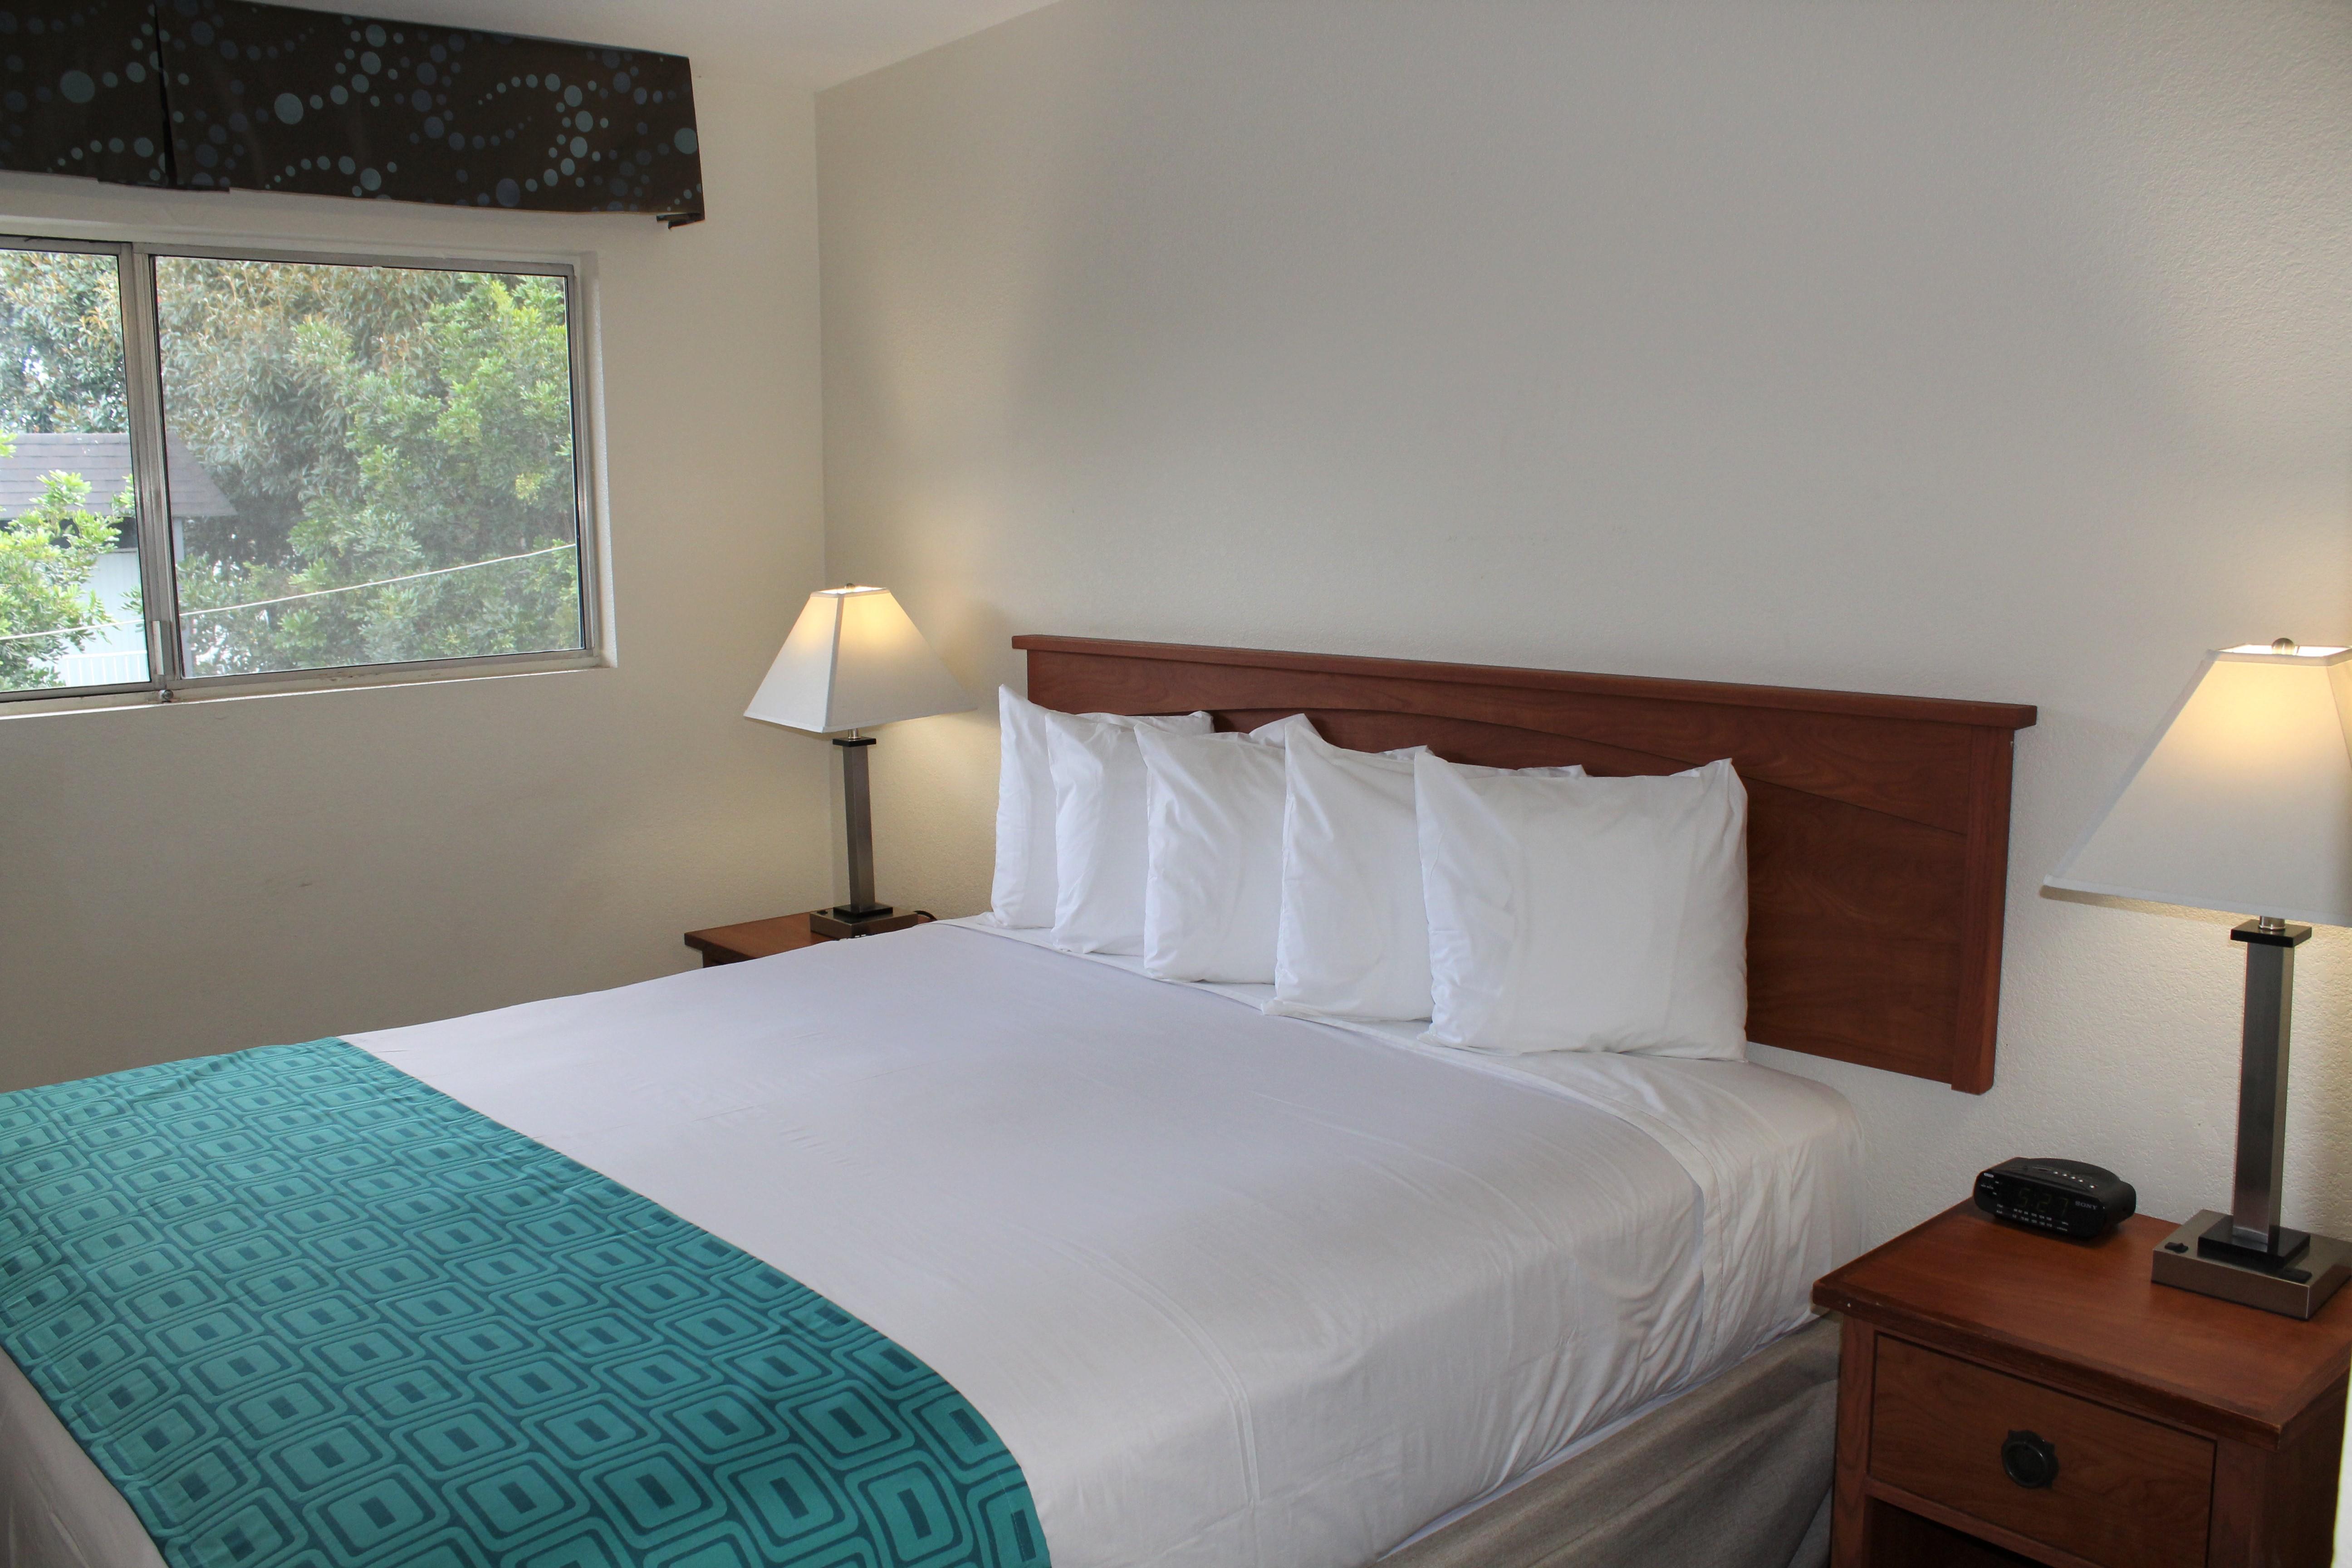 Howard Johnson by Wyndham Chula Vista San Diego Suite Hotel image 0